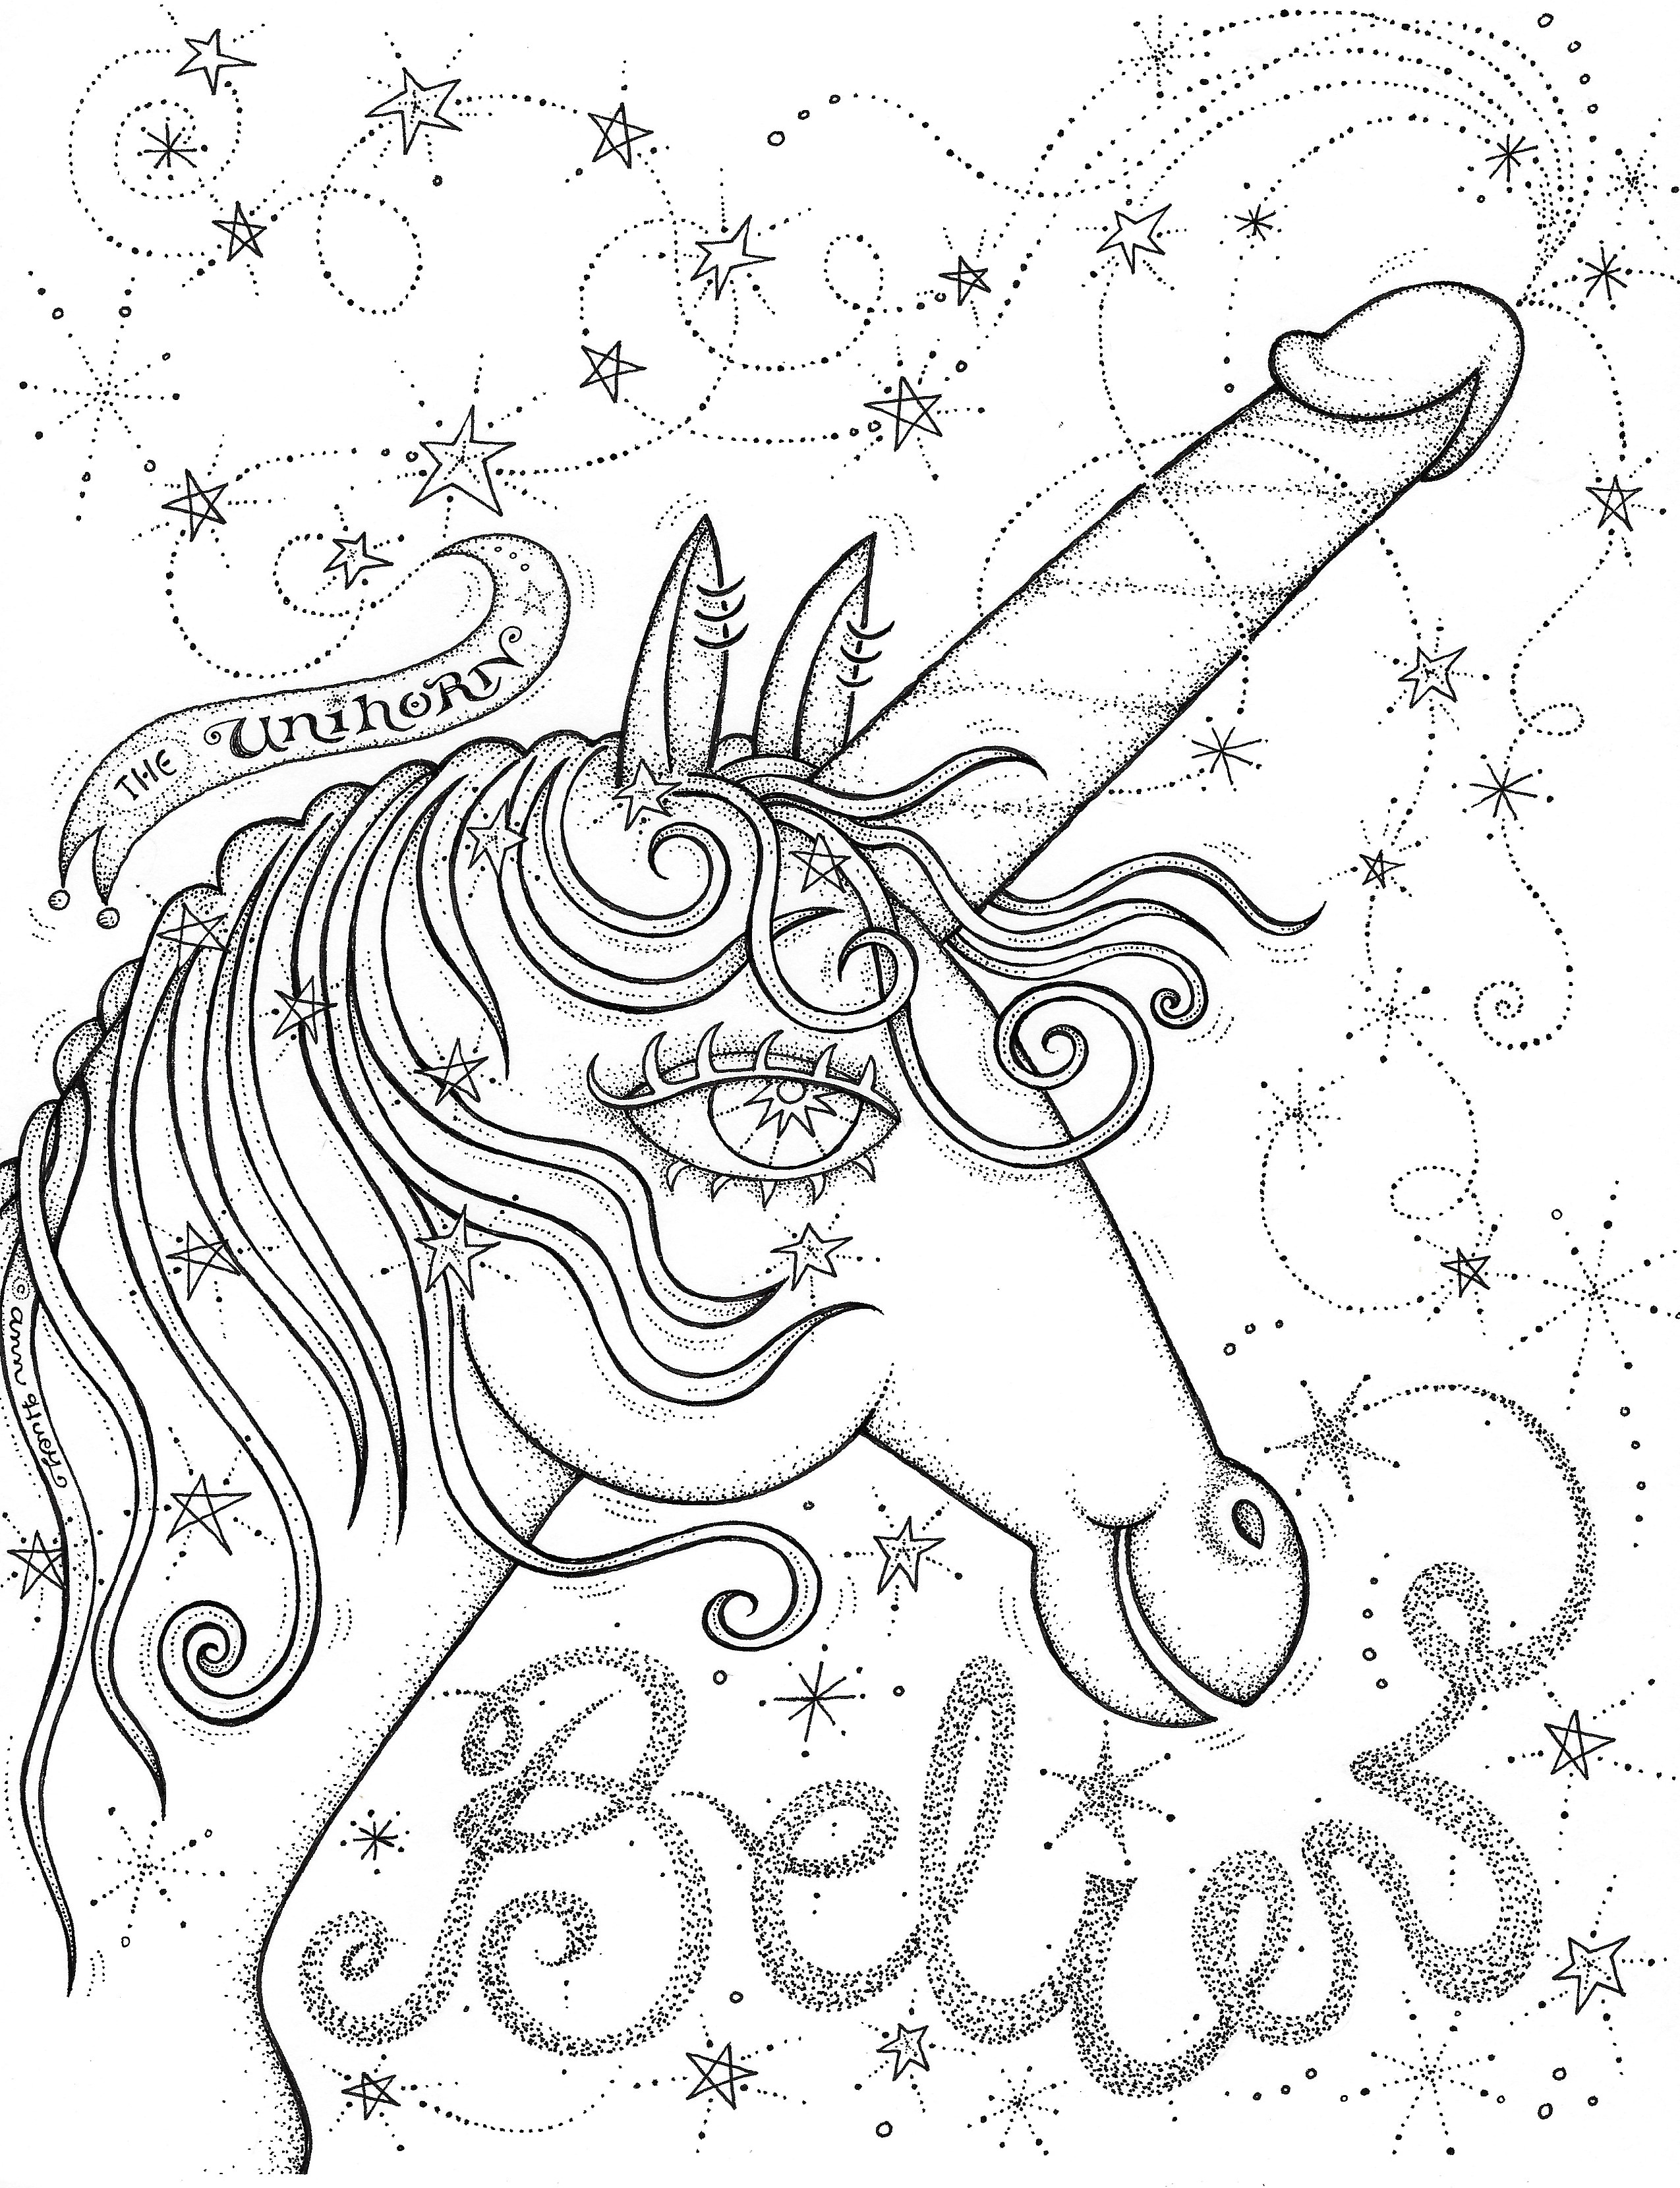 JUNE - Believe (The Unihorn)